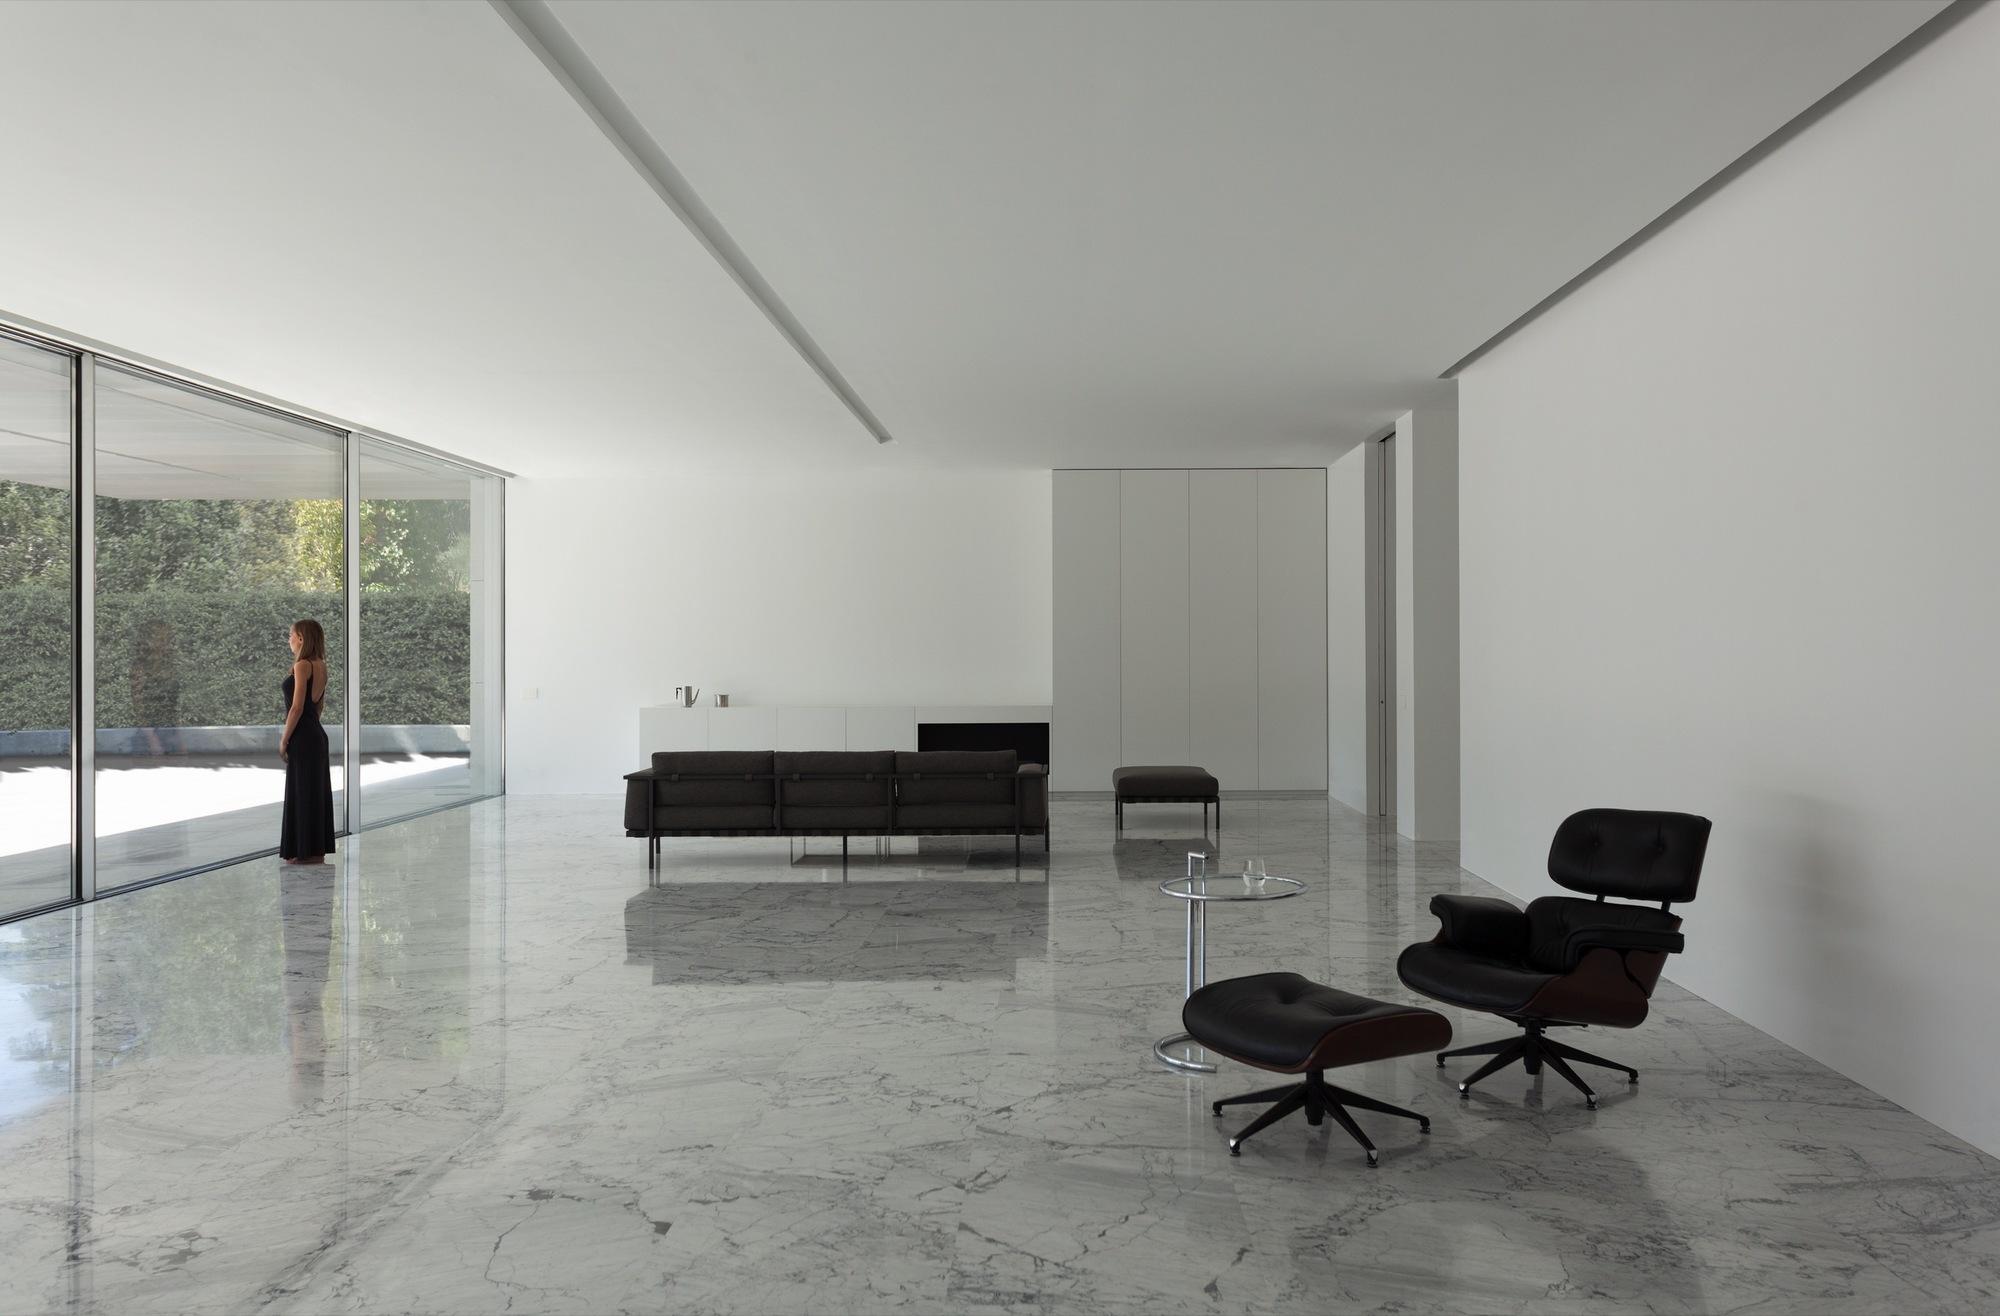 Gallery of aluminum house fran silvestre arquitectos 6 - Arquitectos de interiores ...